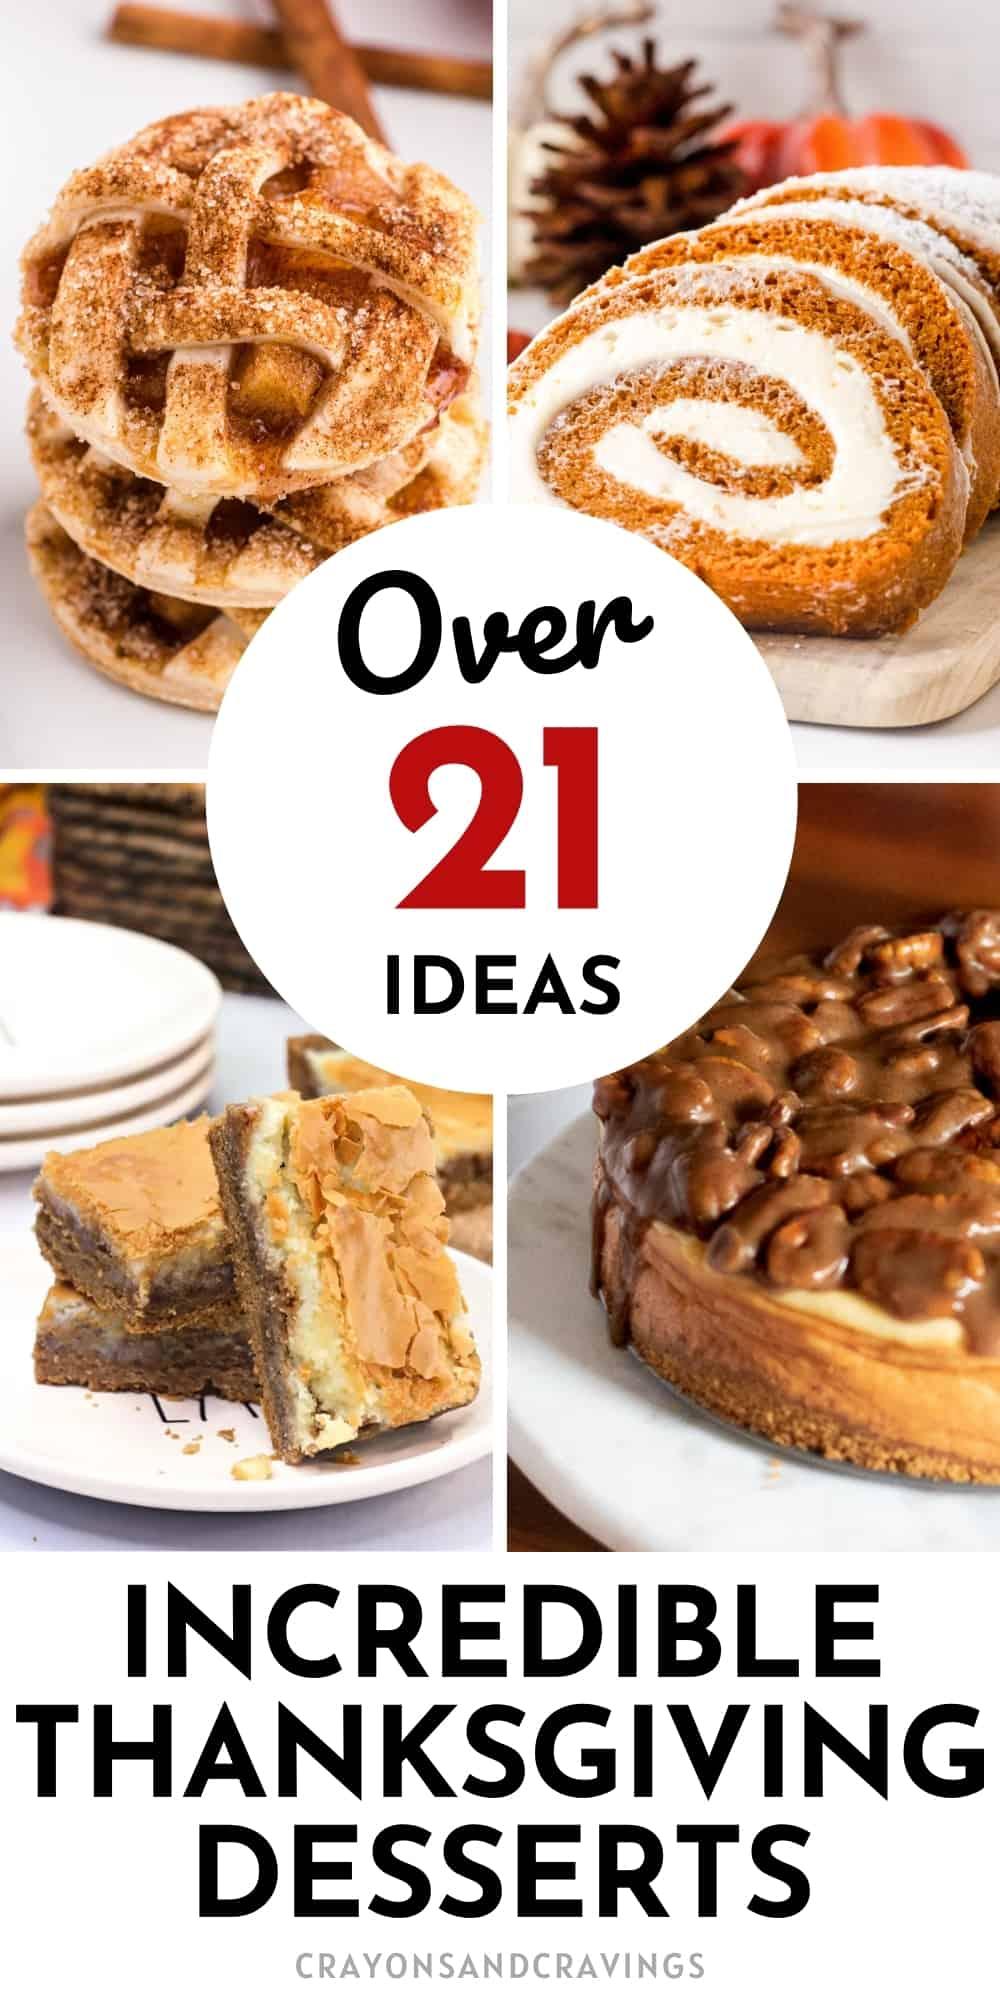 Over 21 Thanksgiving Dessert Ideas